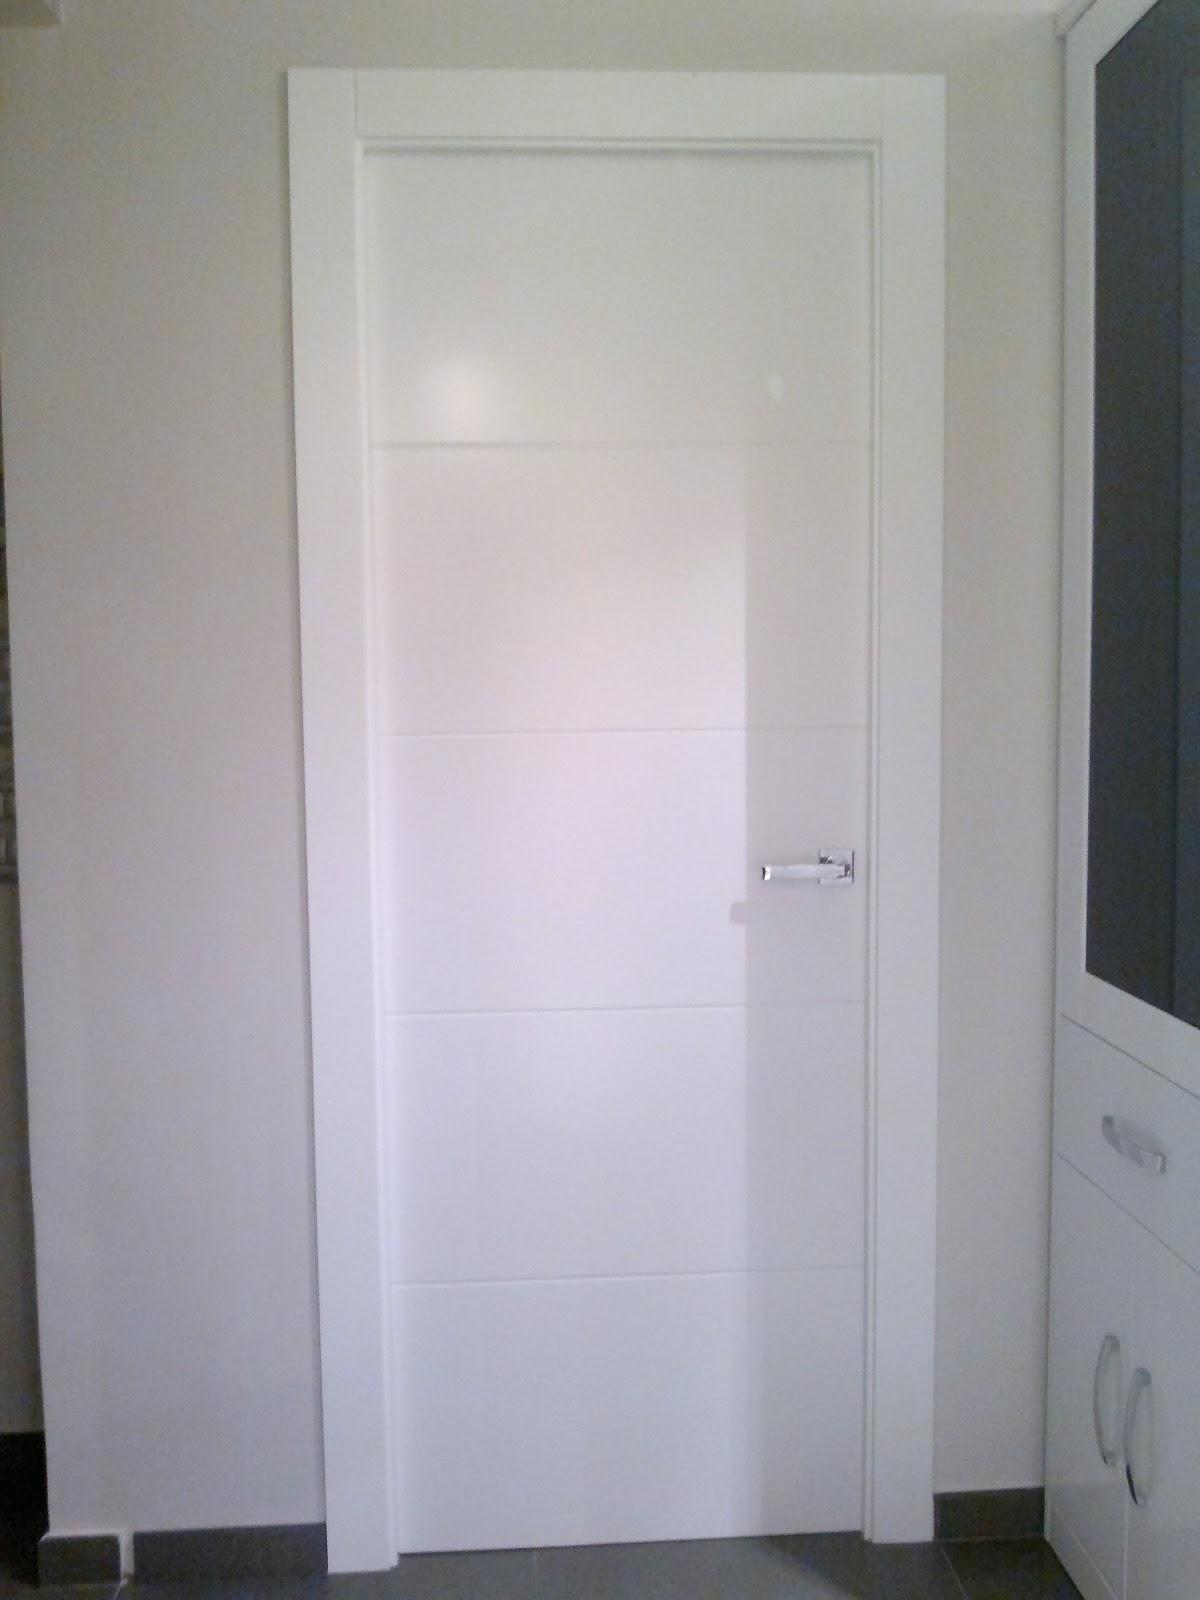 josecremadescarpinteria puertas de paso blancas con rayas